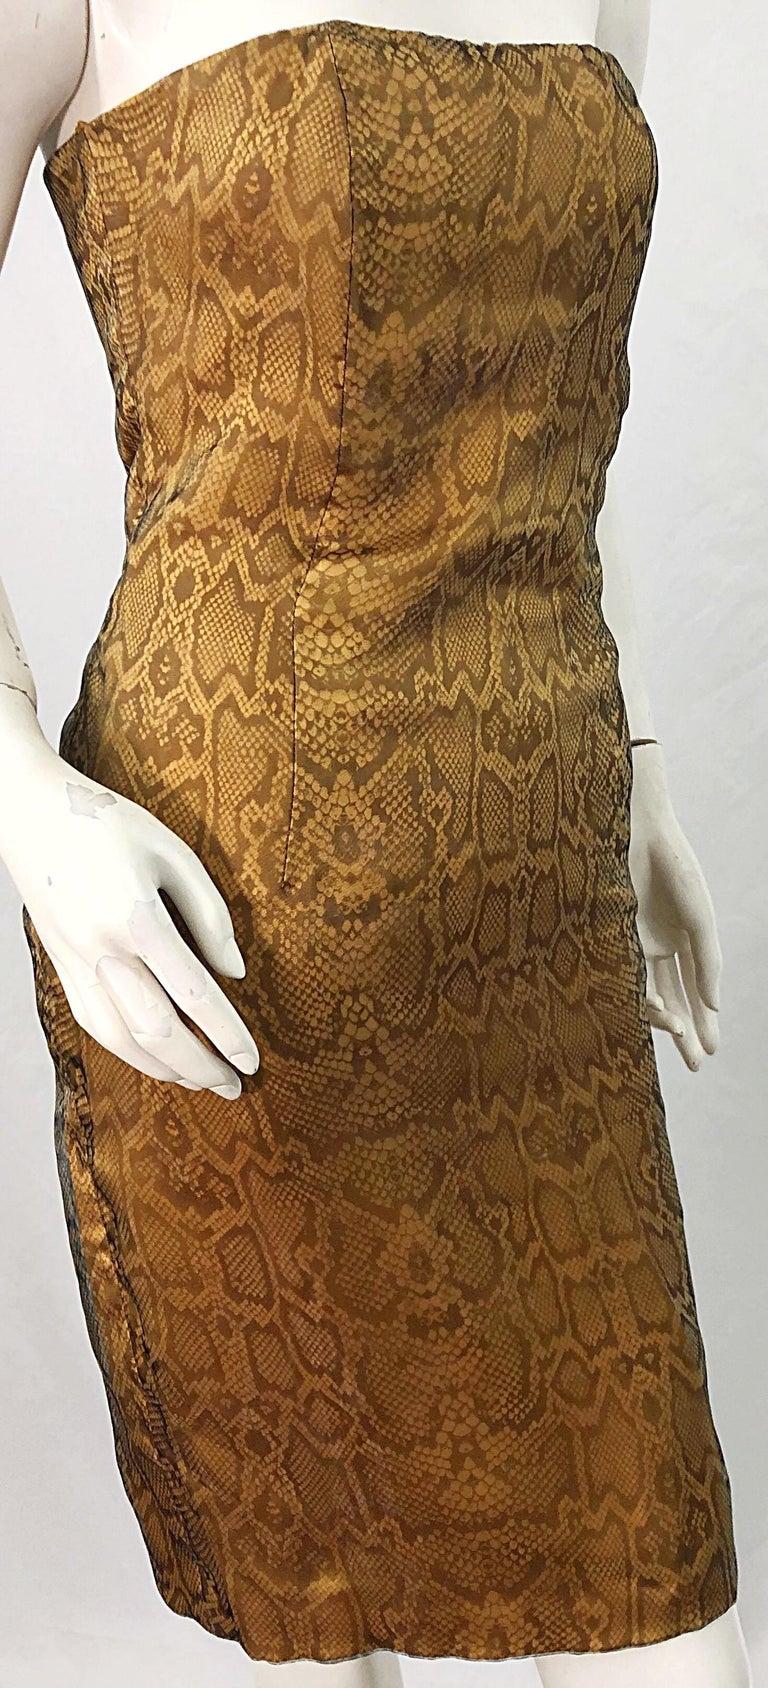 1990s Luca Luca Size 42 / 6 Snakeskin Silk Organza Strapless 90s Tan Brown Dress For Sale 7